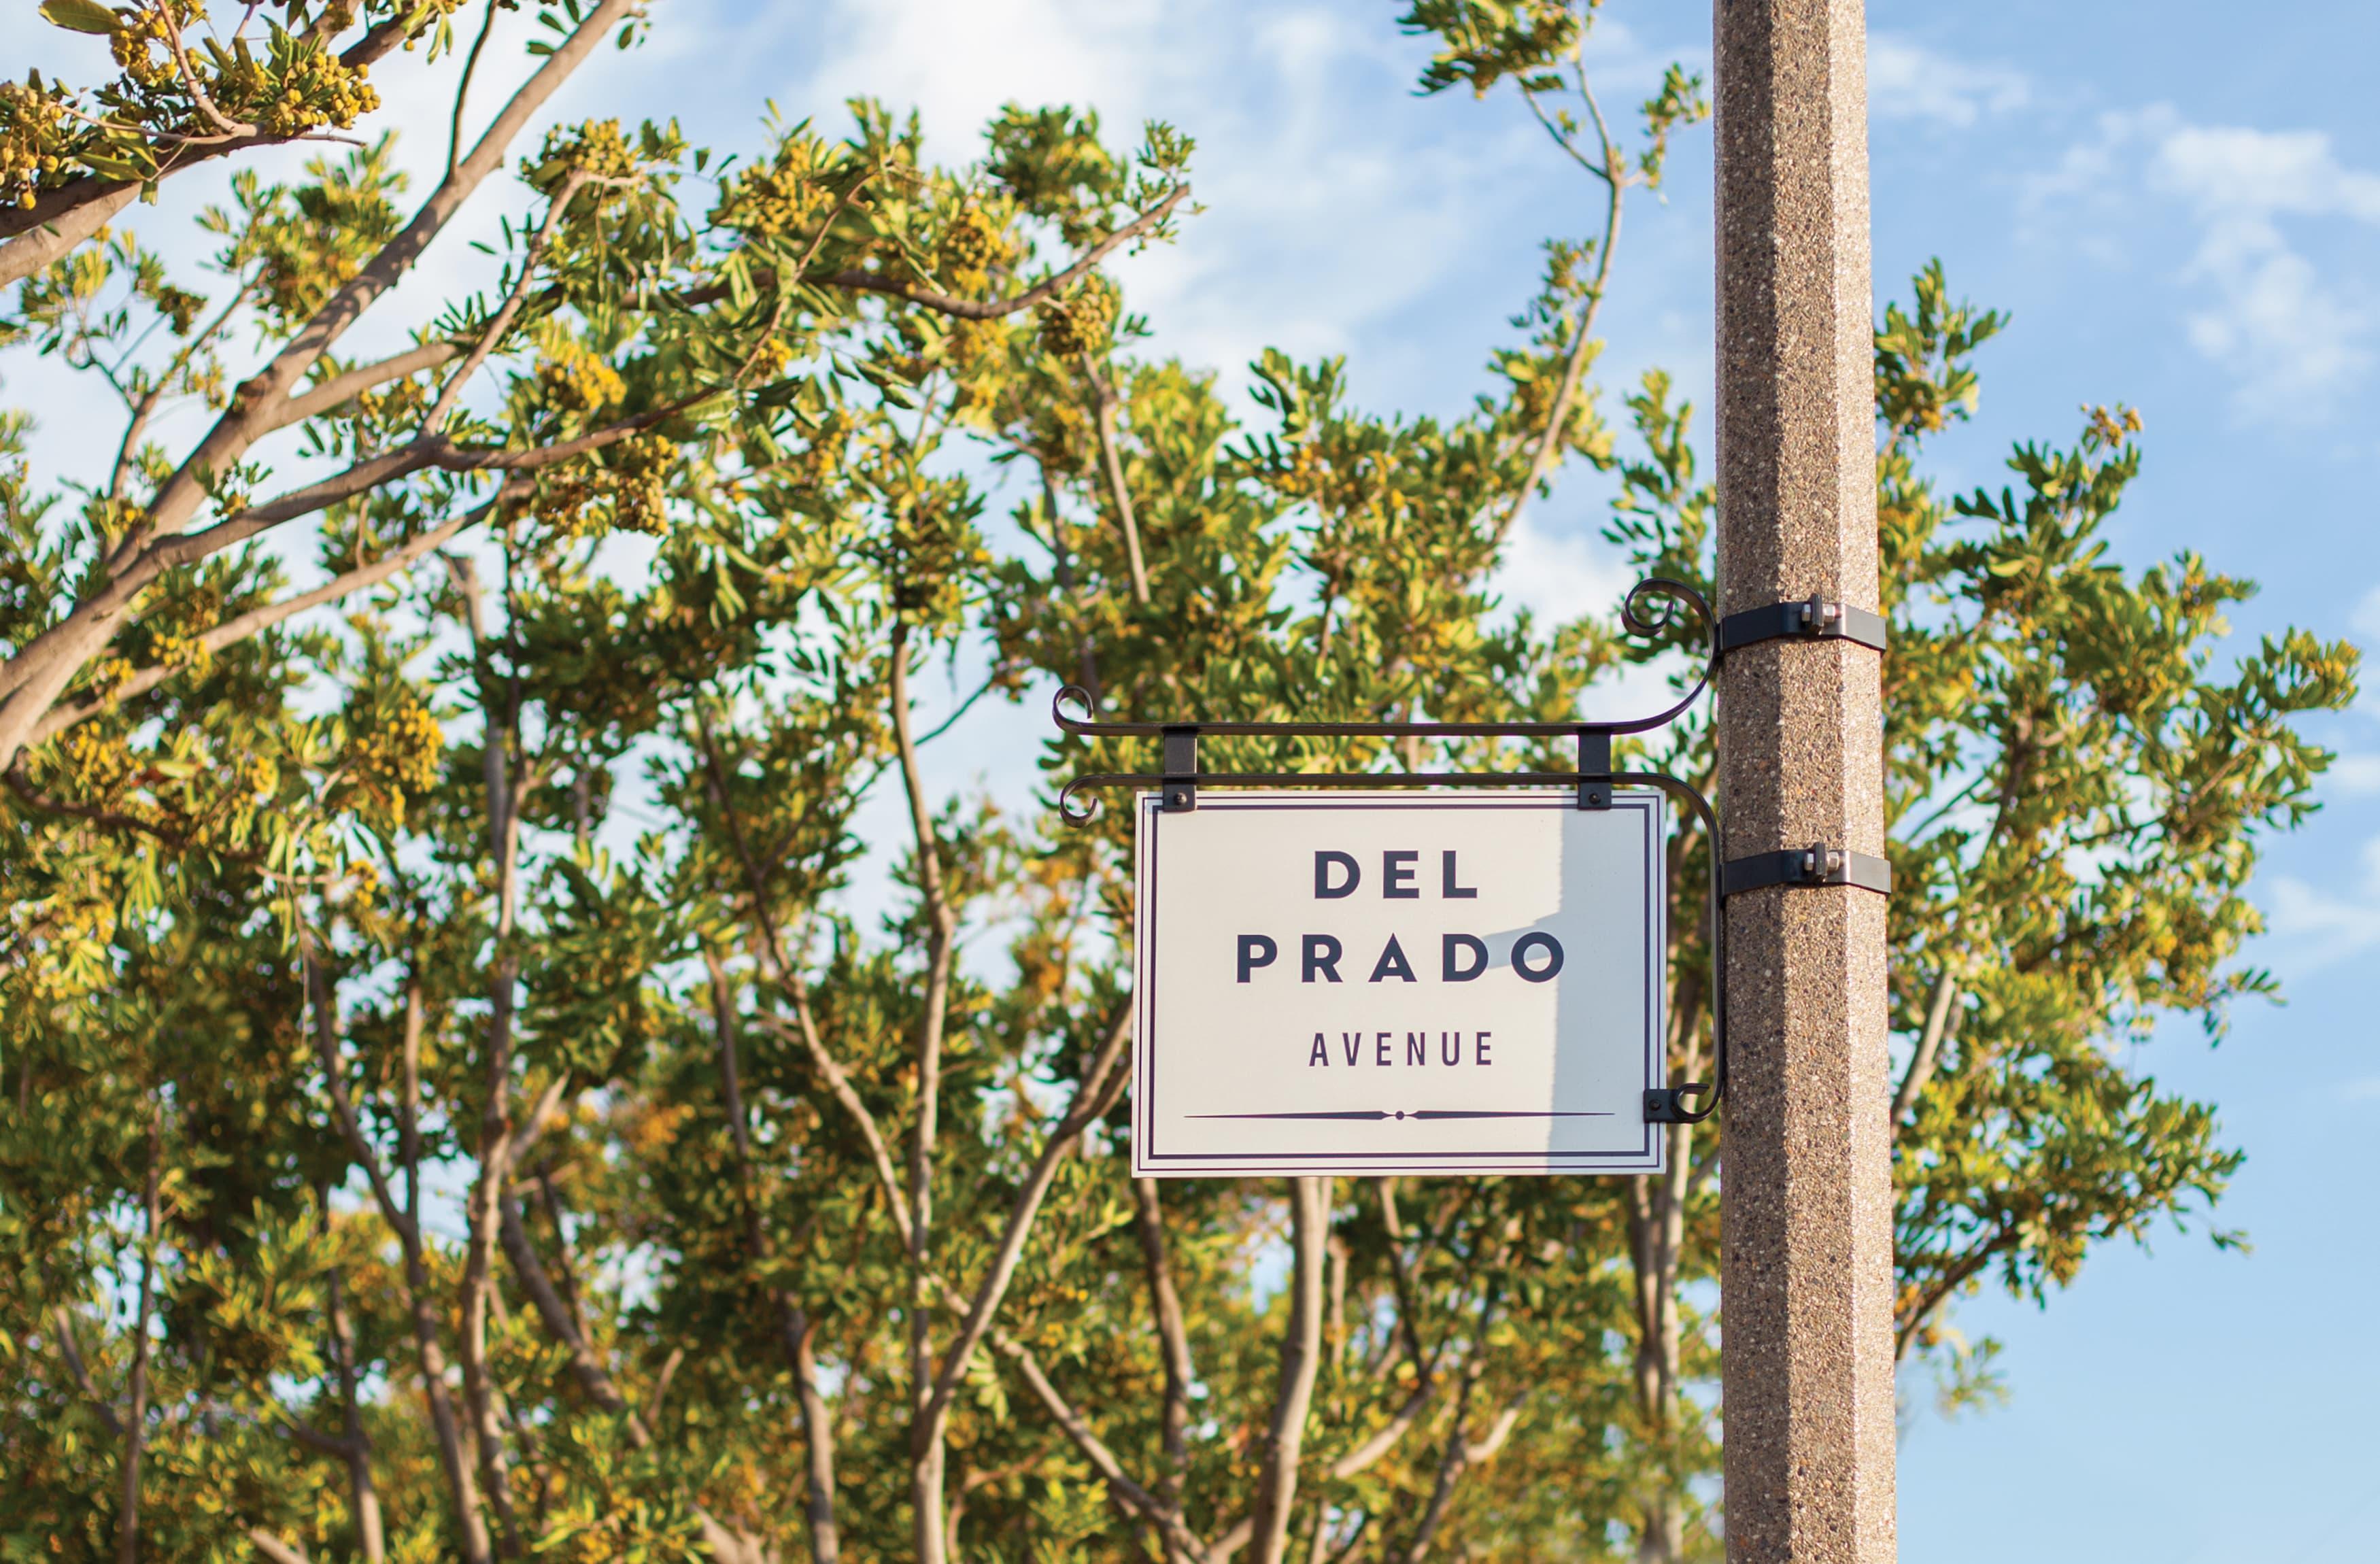 The City of Dana Point street identity sign civic design